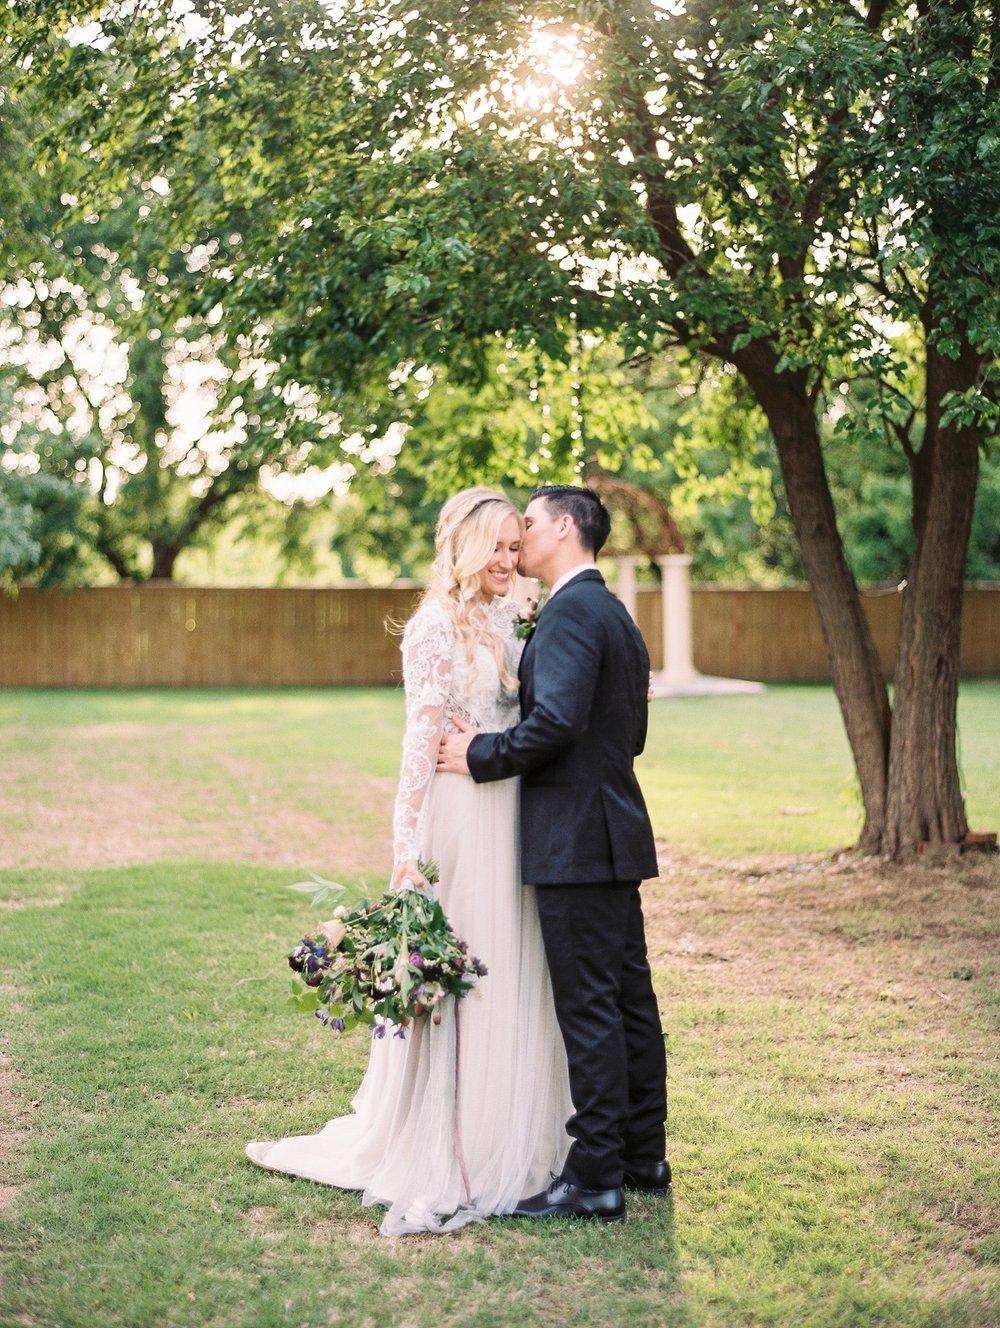 Elope In Style - Jessica Kersey - Northwest Arkansas Wedding Photographer_0196